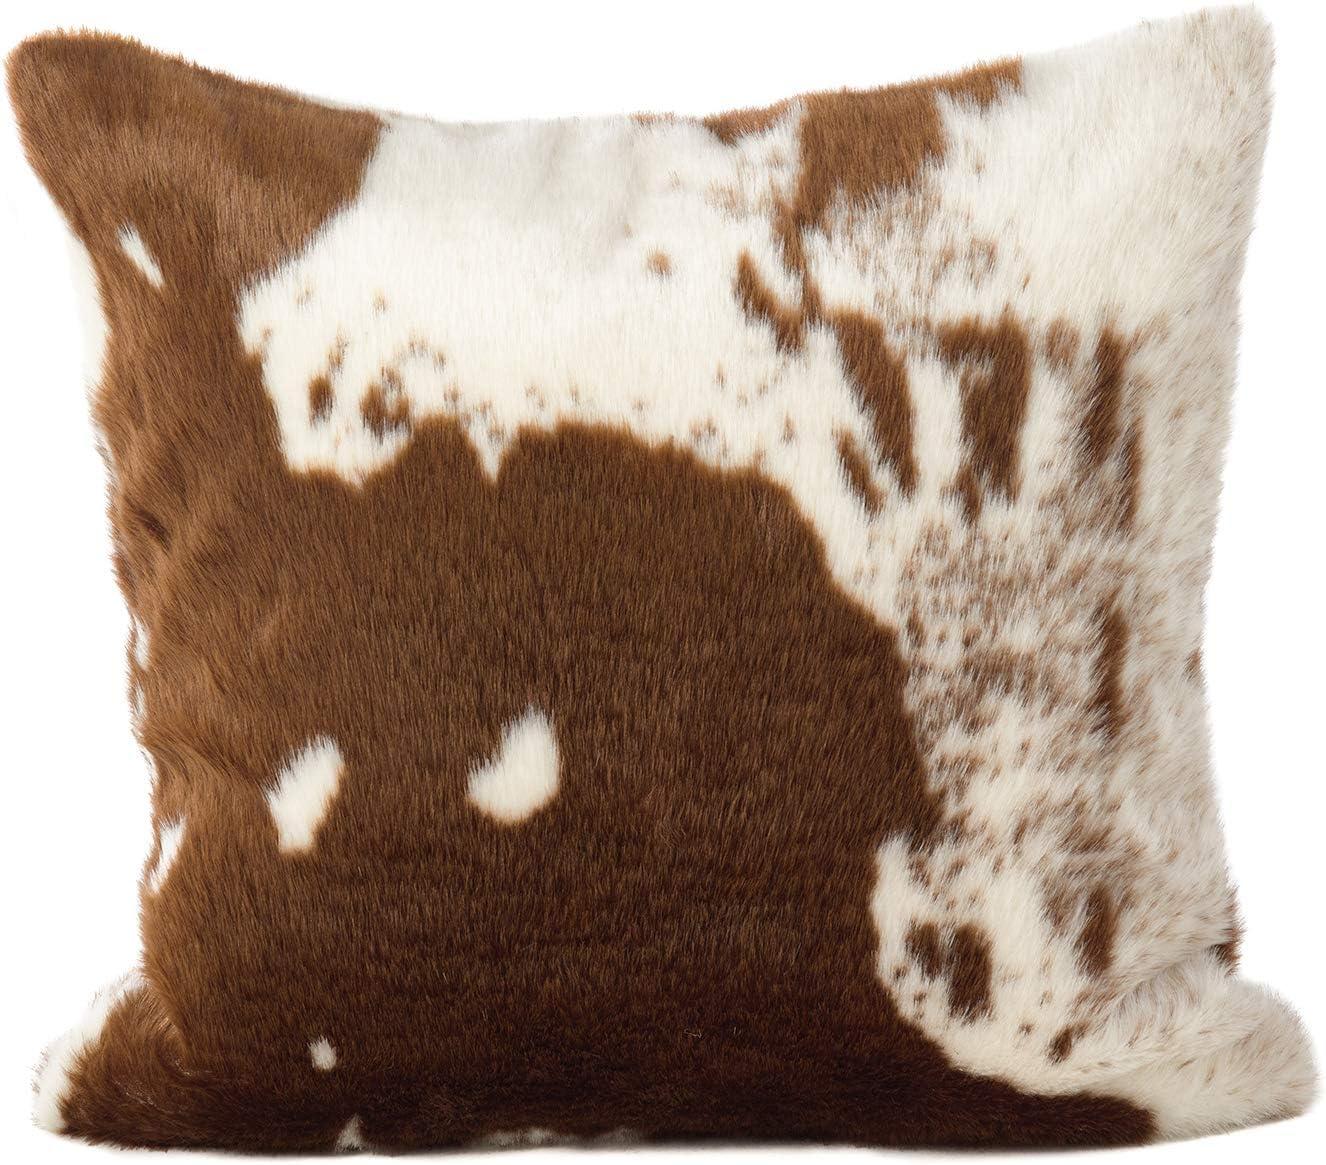 Atlanta Mall Fennco Styles Rustic quality assurance Faux Fur Cow Decorative x T Hide 18 Inch